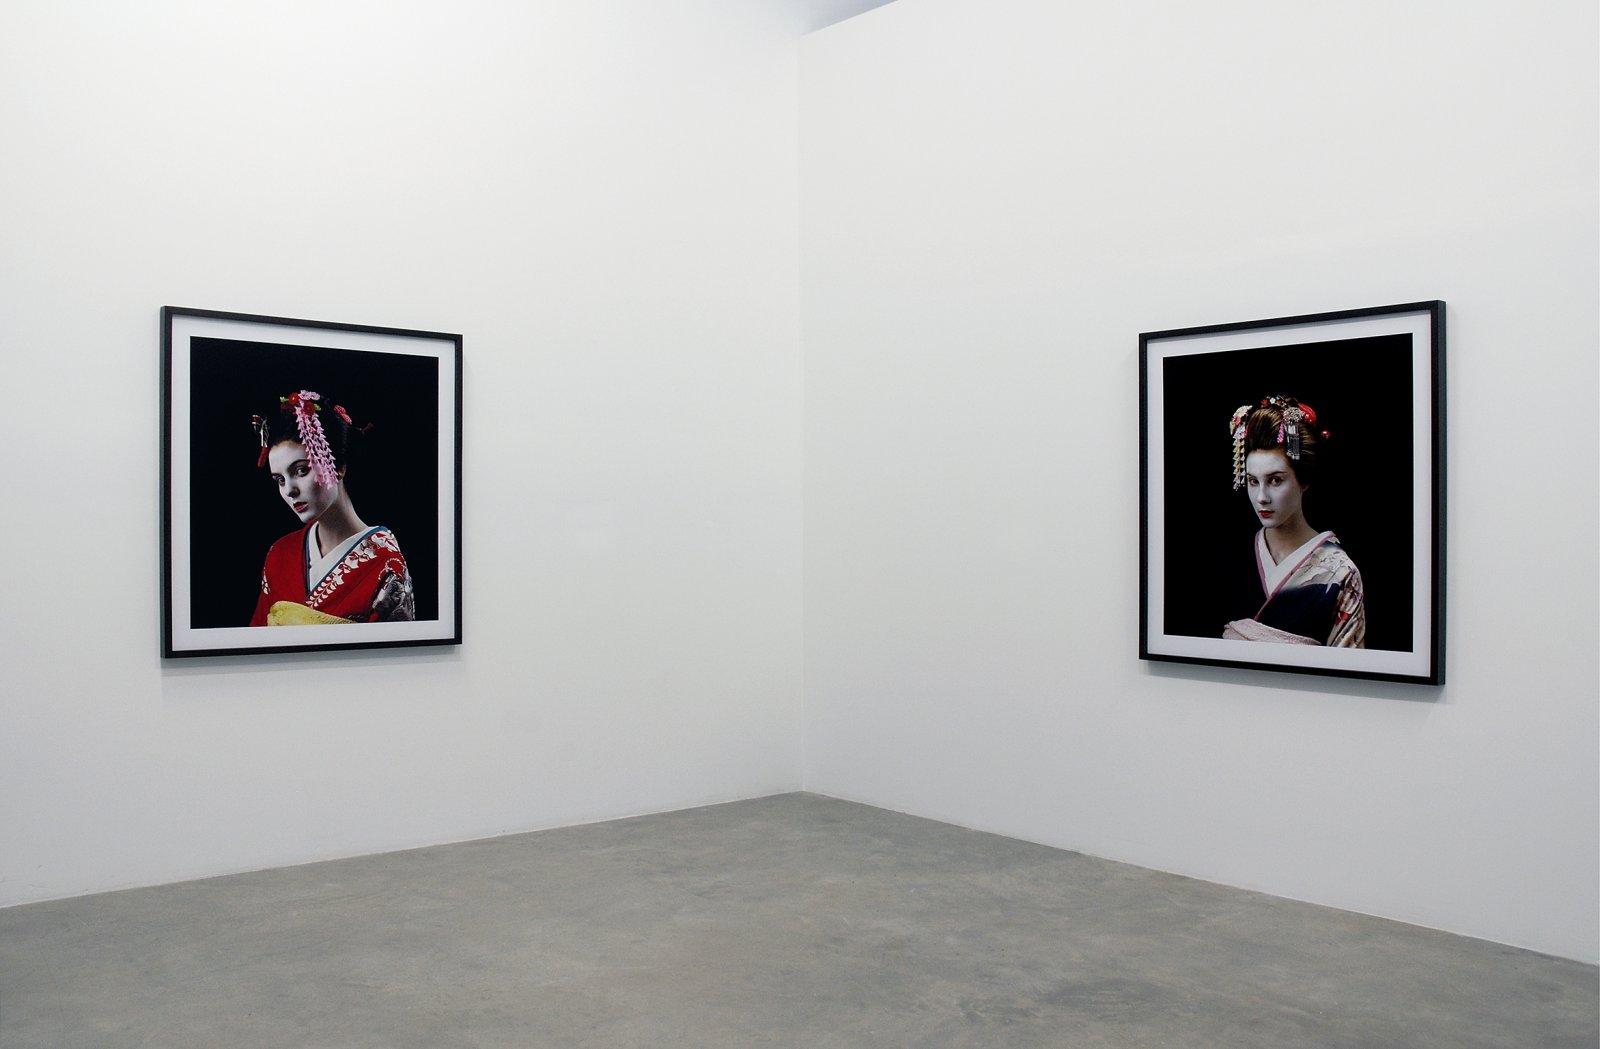 Ron Terada, installation view, Catriona Jeffries, 2008 by Ron Terada